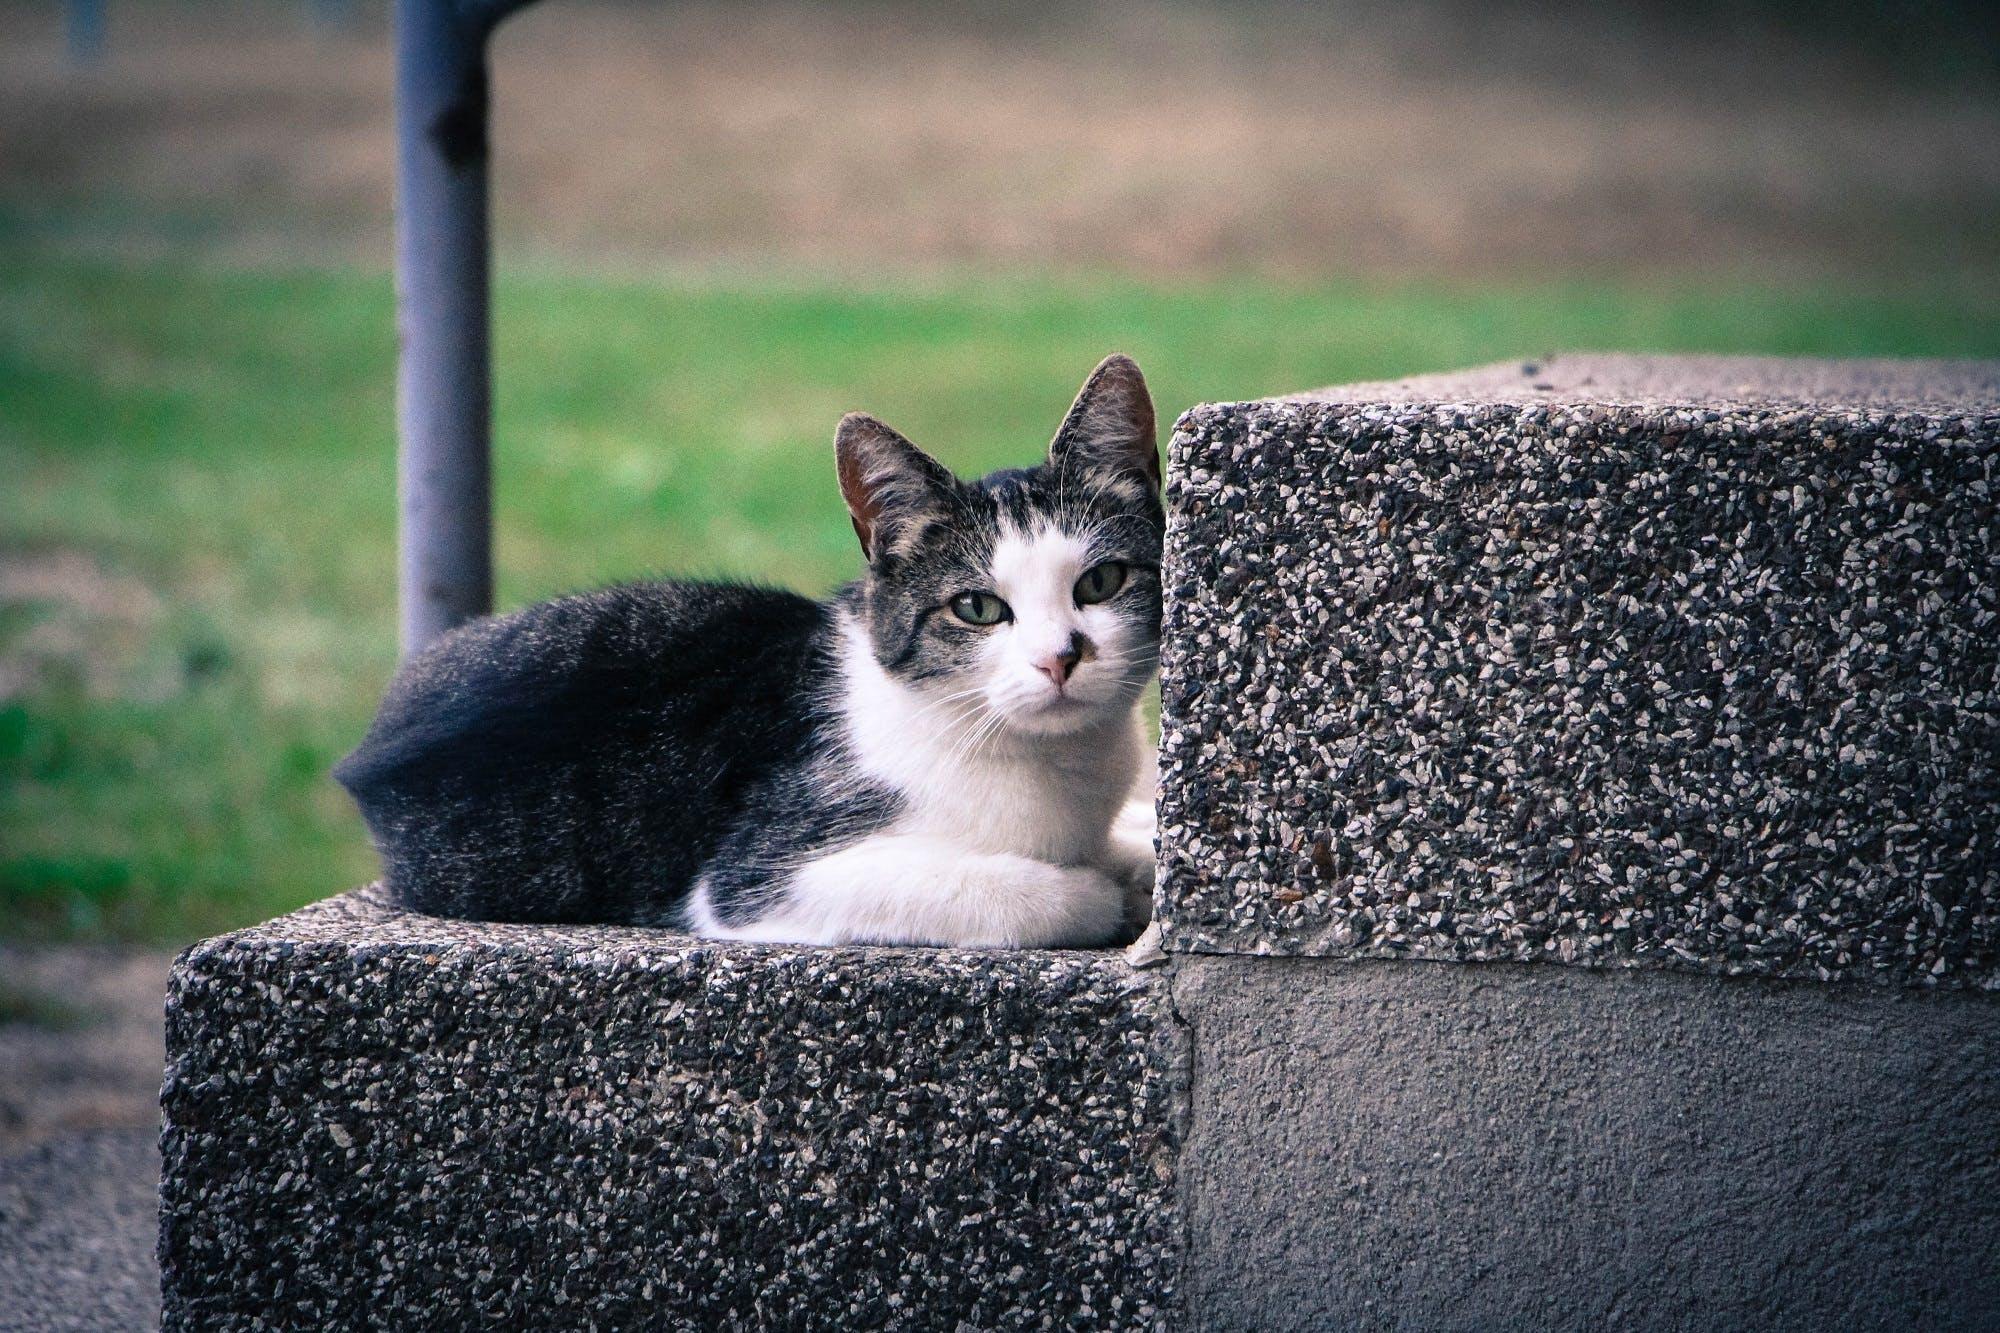 Black and White Kitten Lying on Gray Concrete Stair